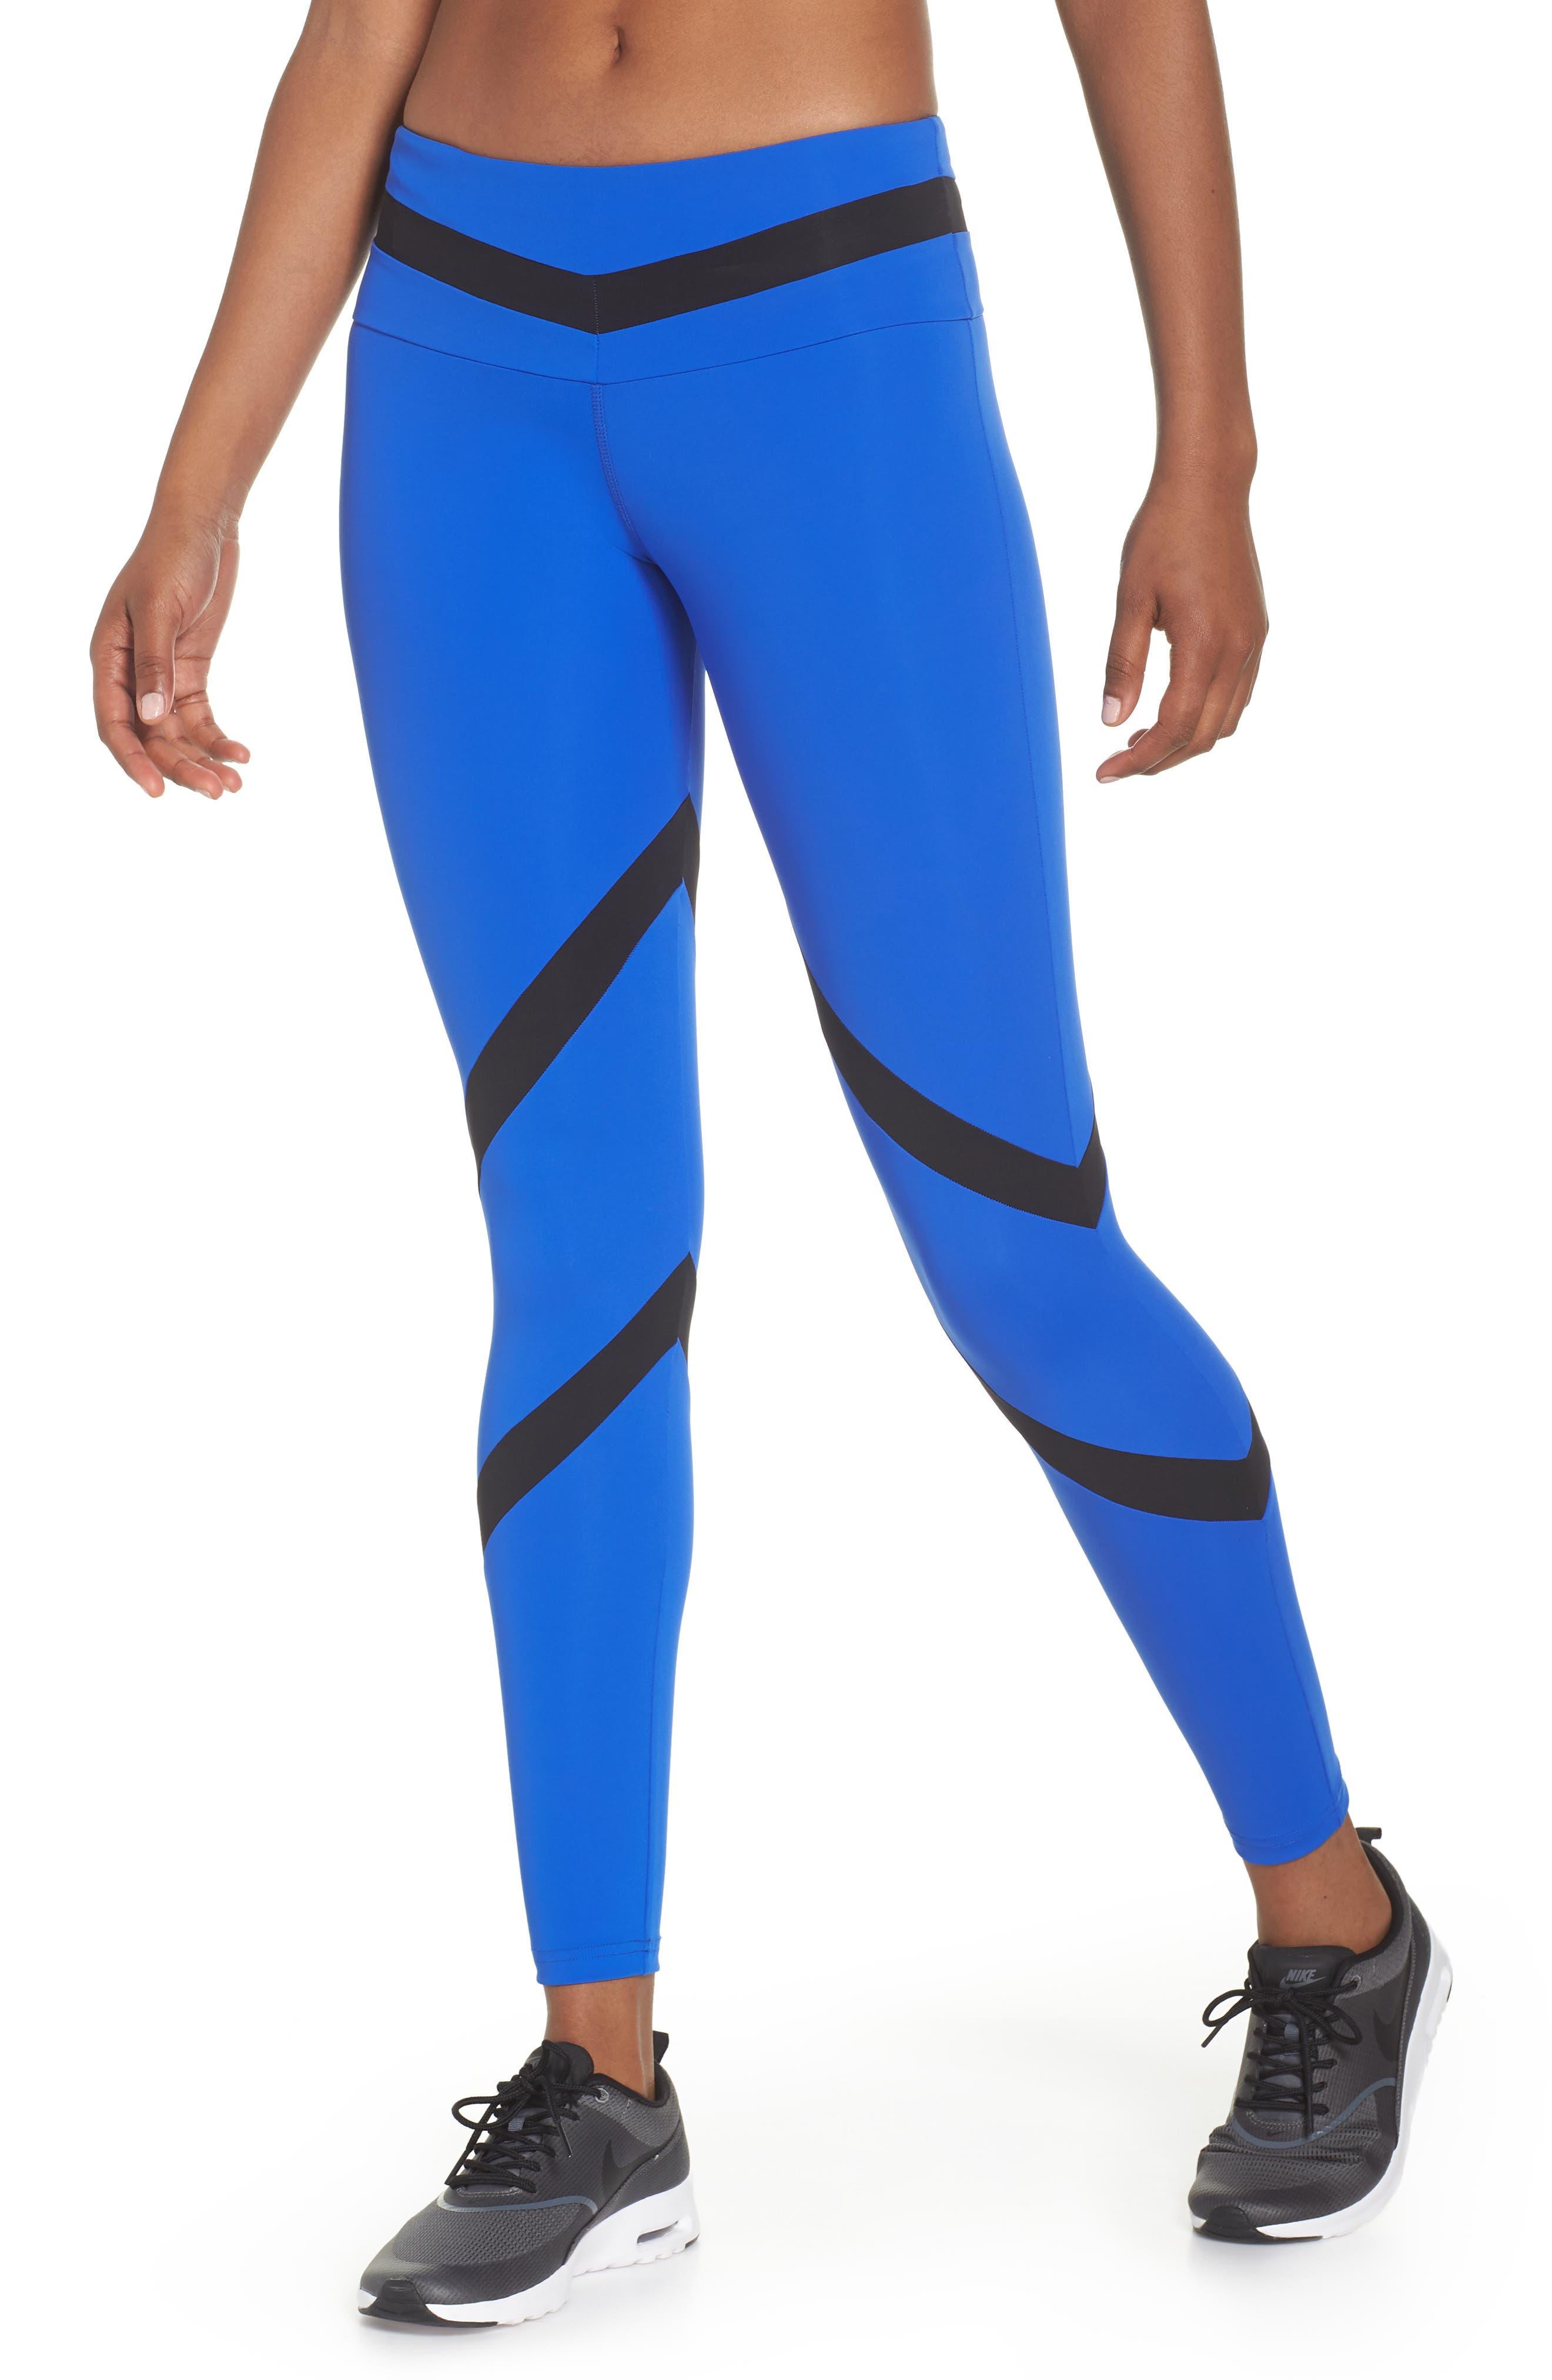 BoomBoom Athletica Tricolor Leggings,                         Main,                         color, Cobalt Blue/ Black